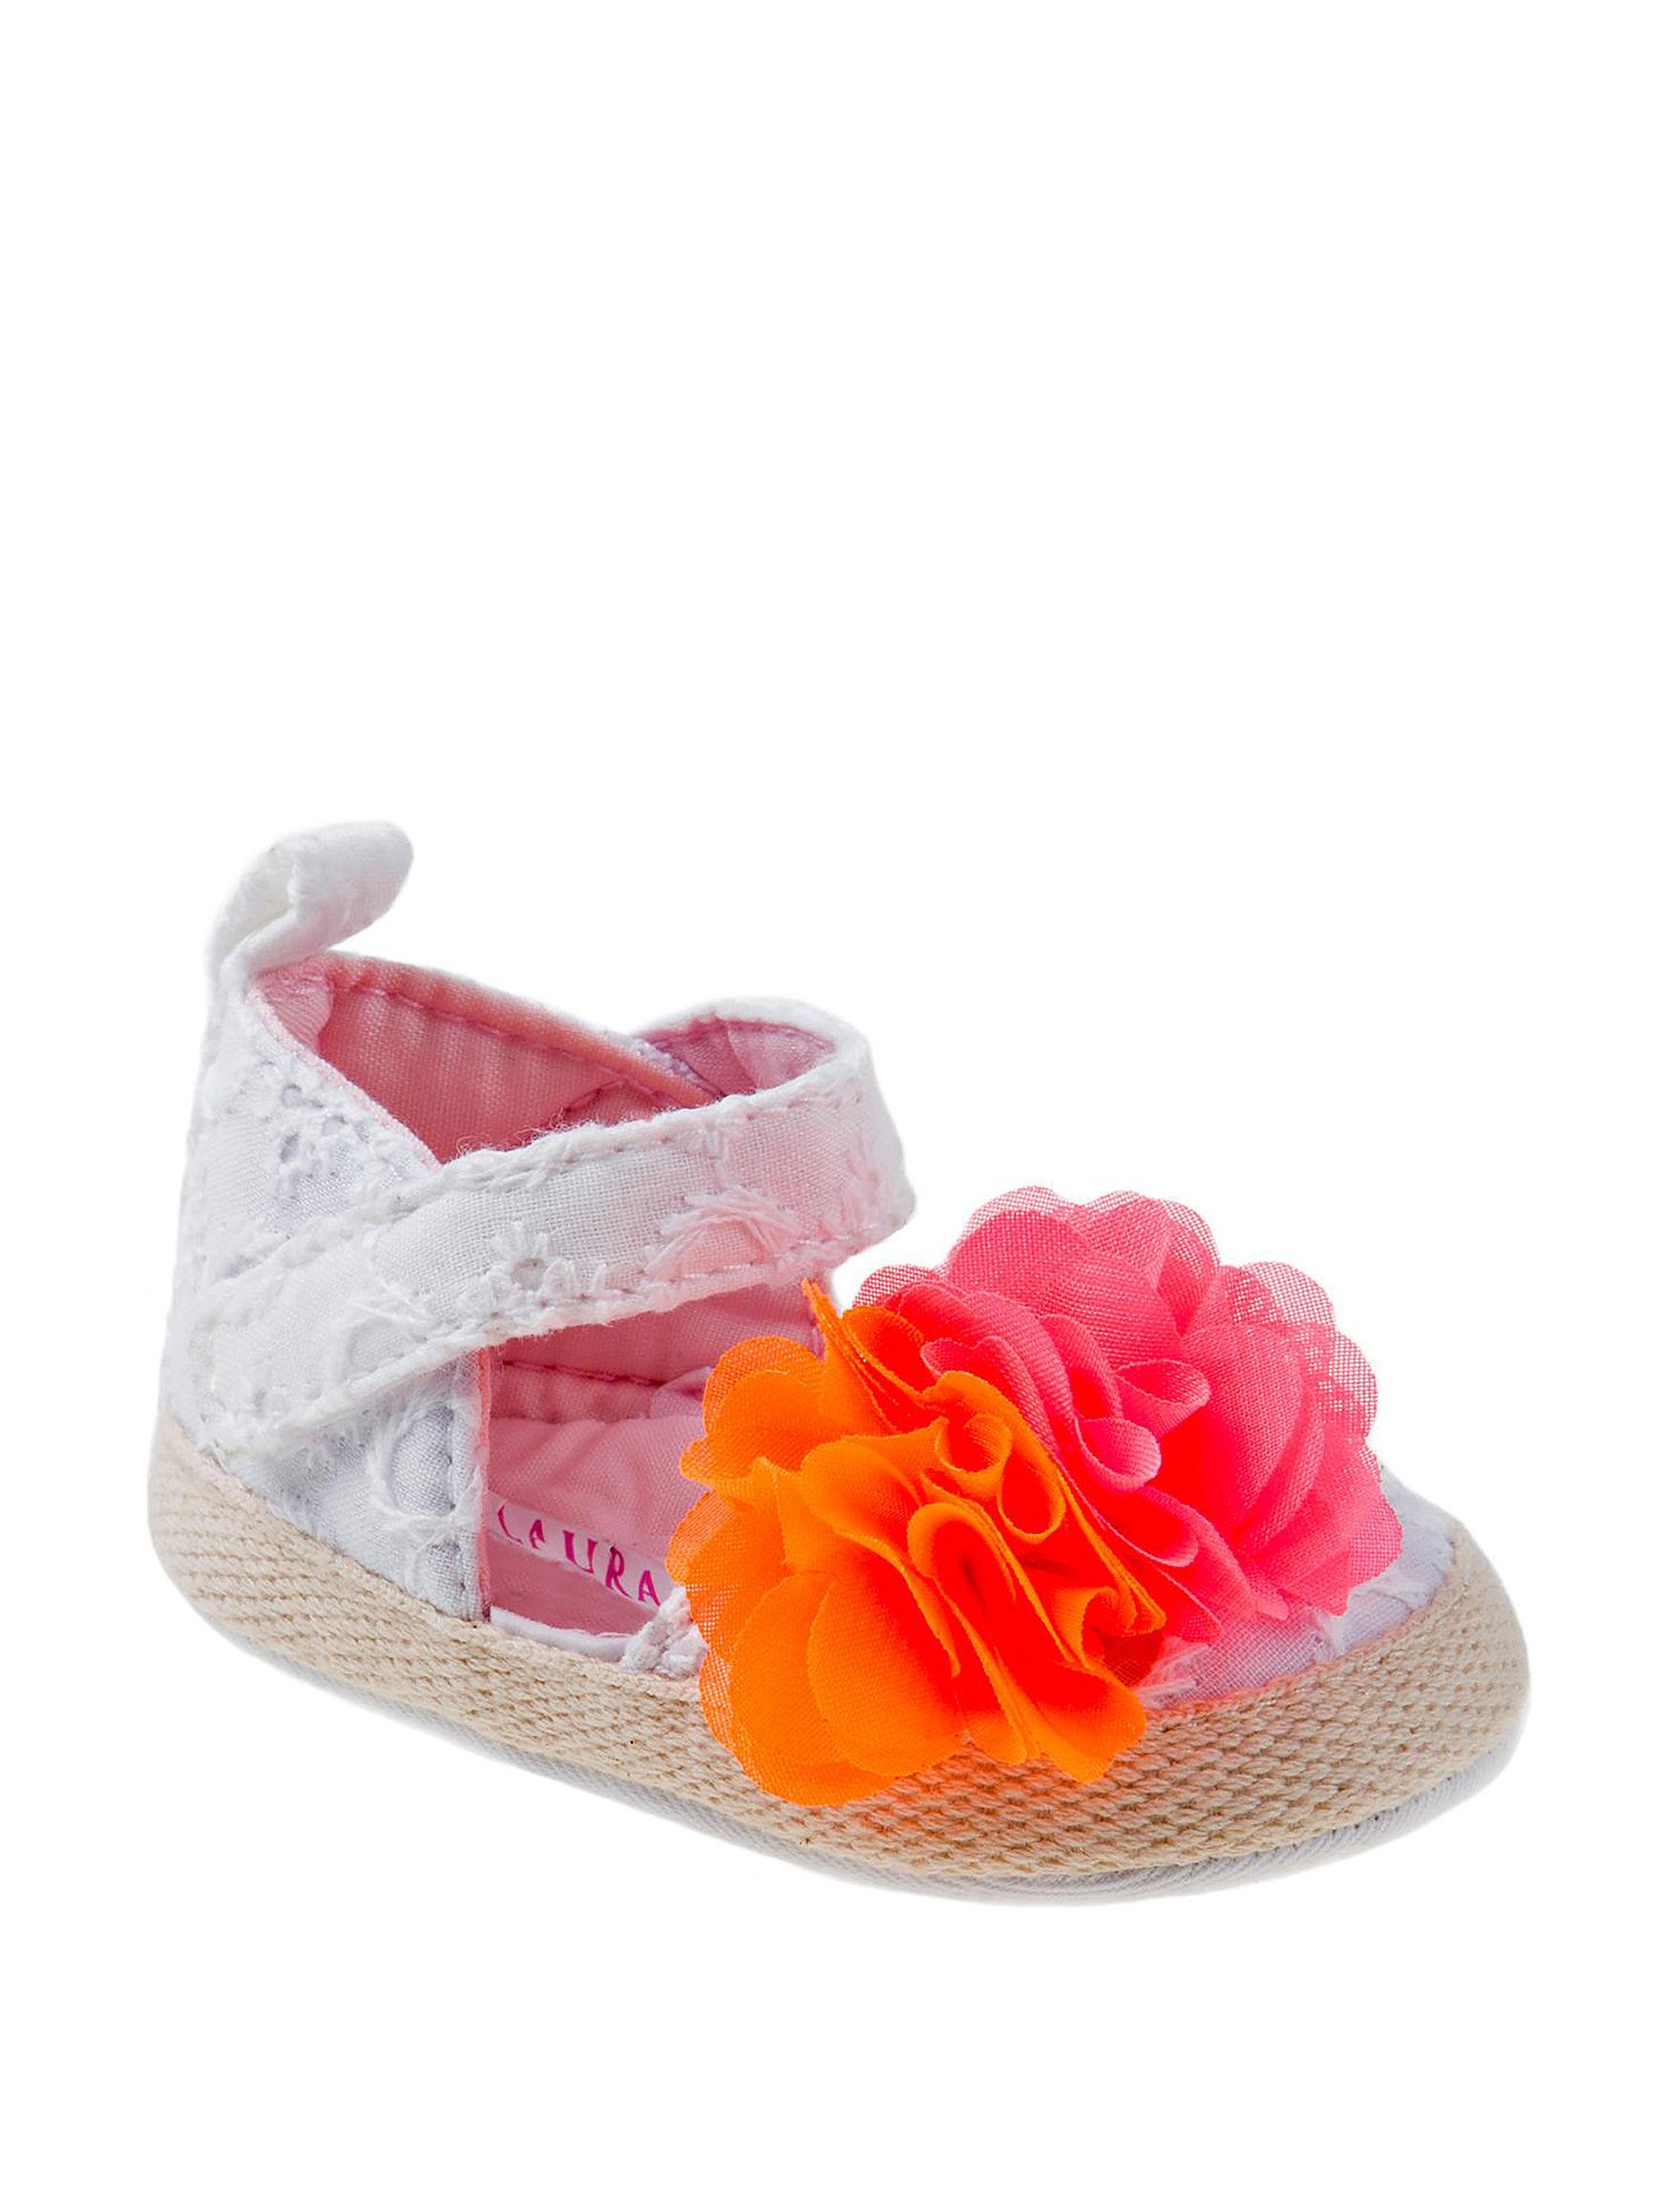 Laura Ashley White Flat Sandals